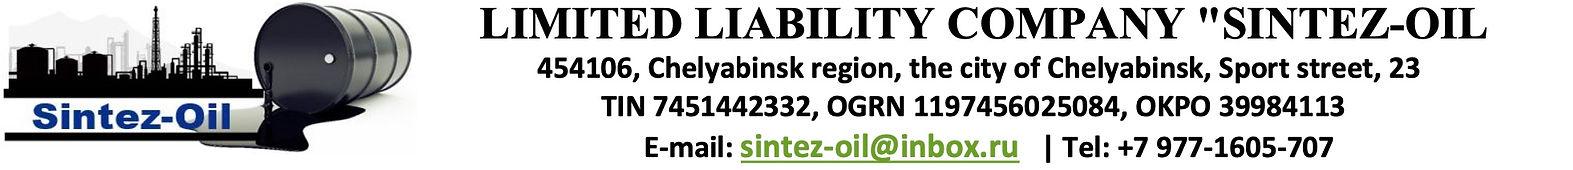 Sintez-Oil